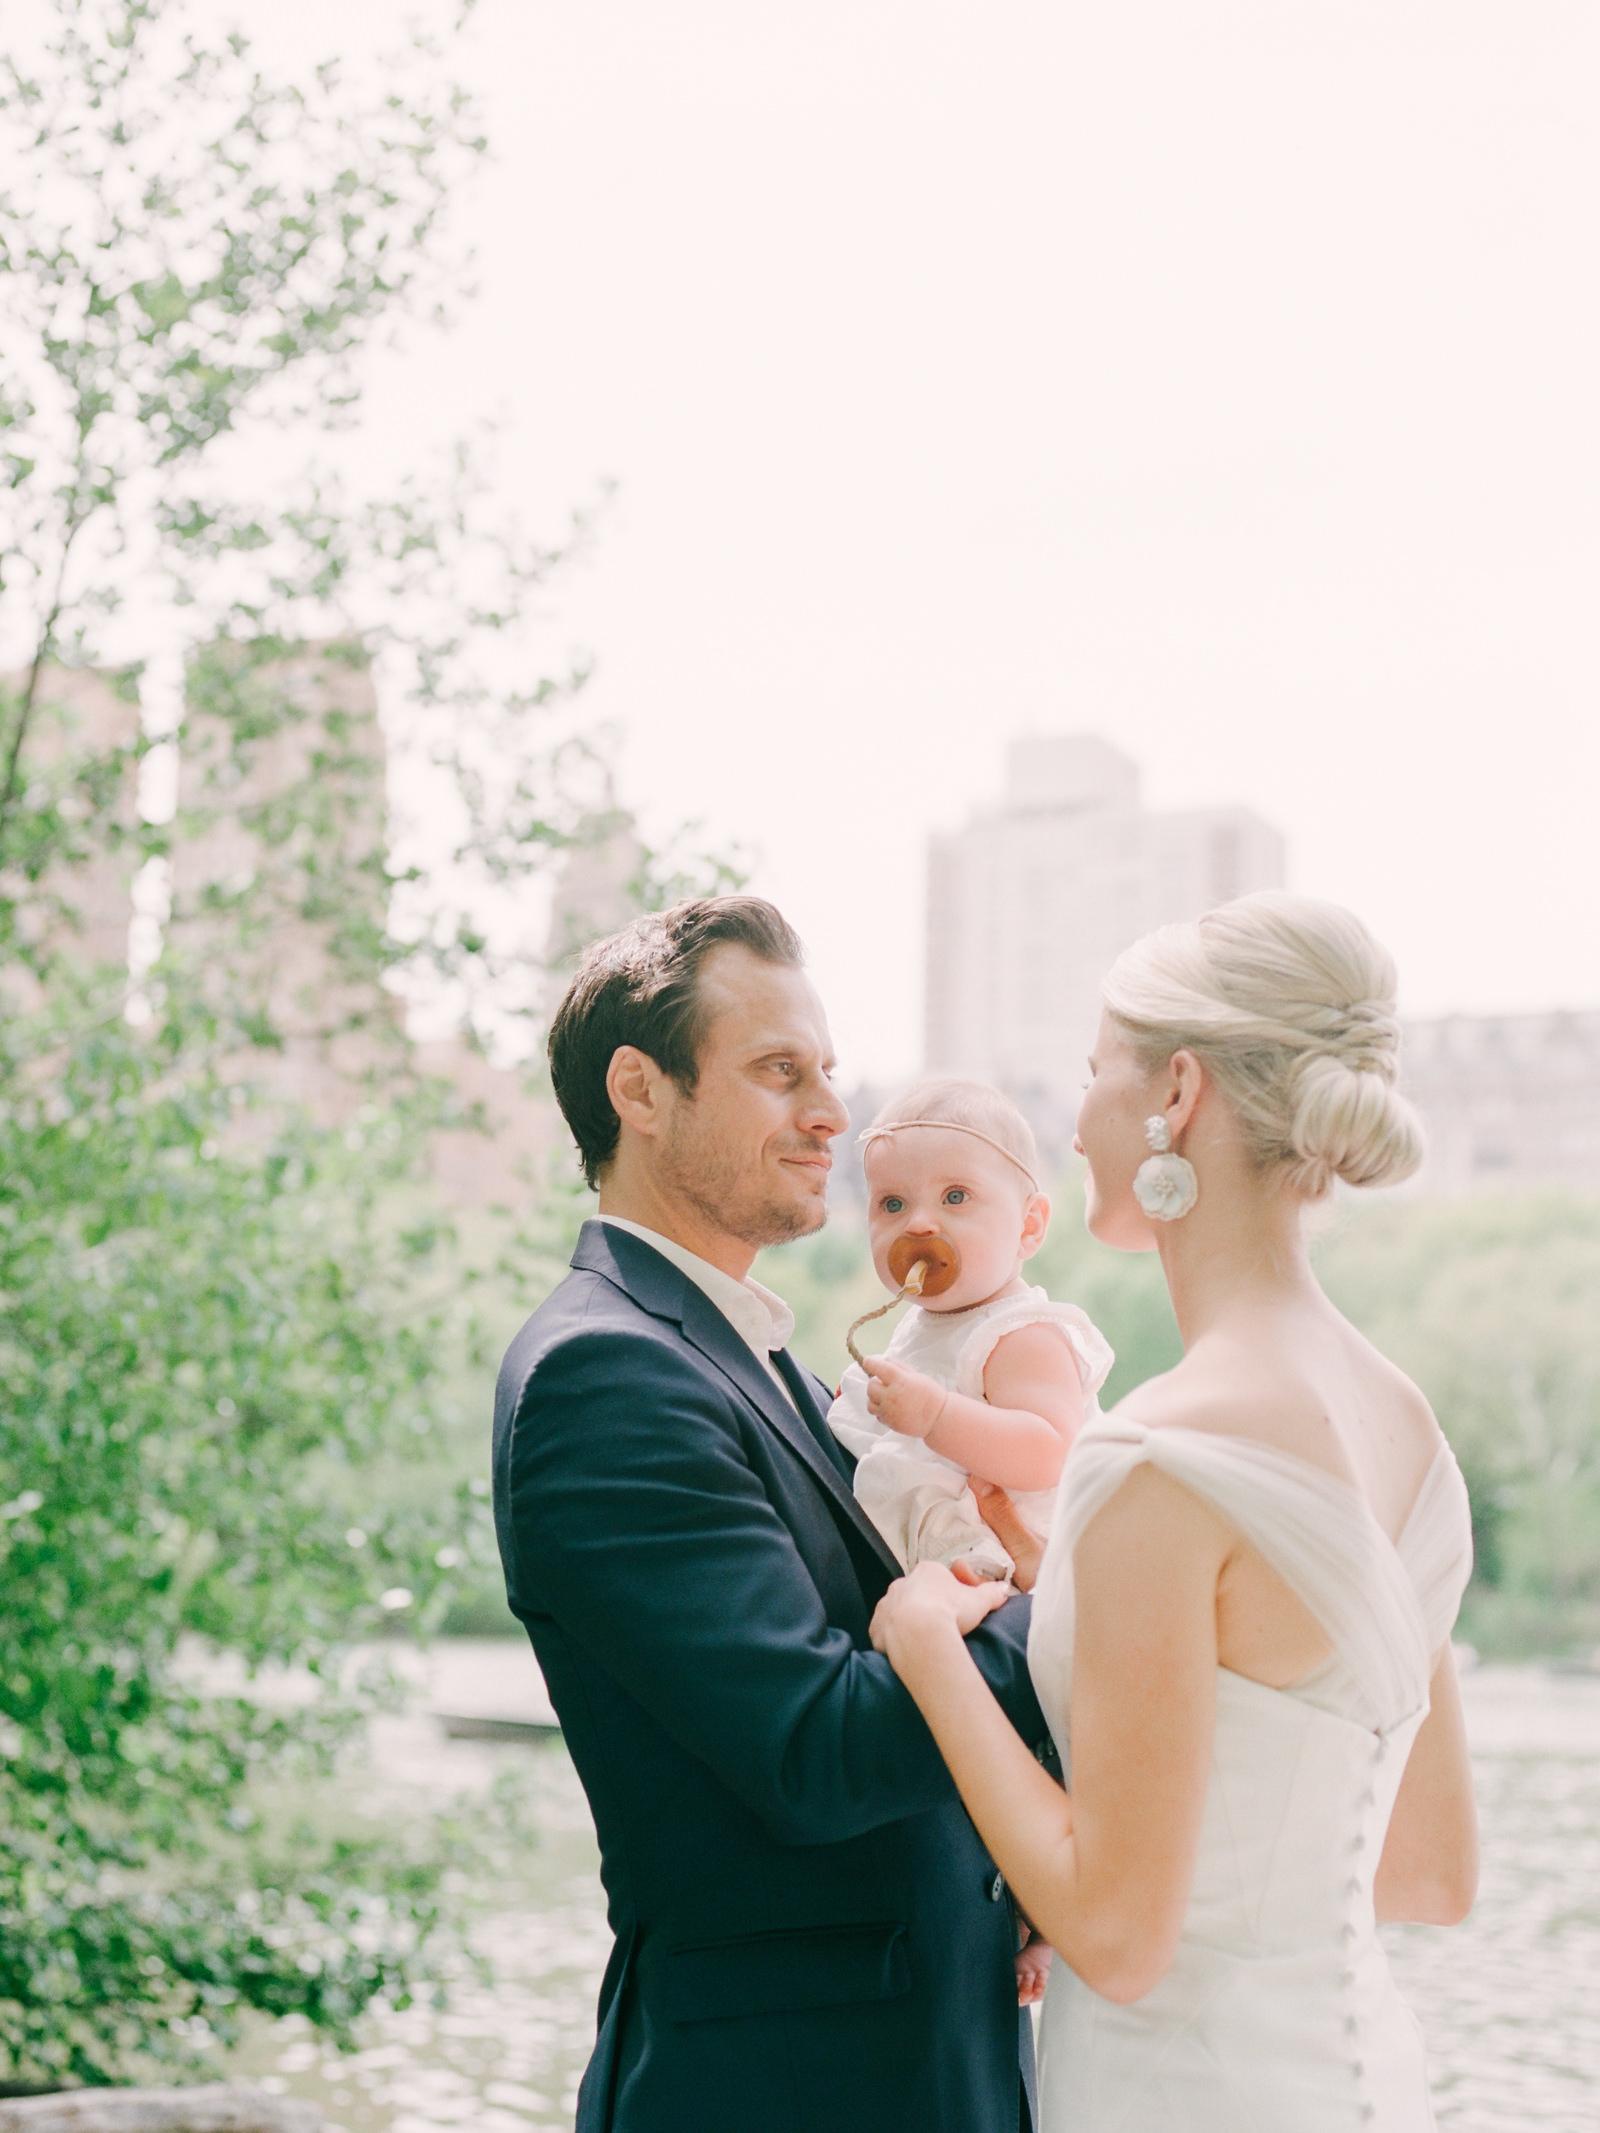 Intimate-NYC_wedding_ by Tanya Isaeva-99.jpg